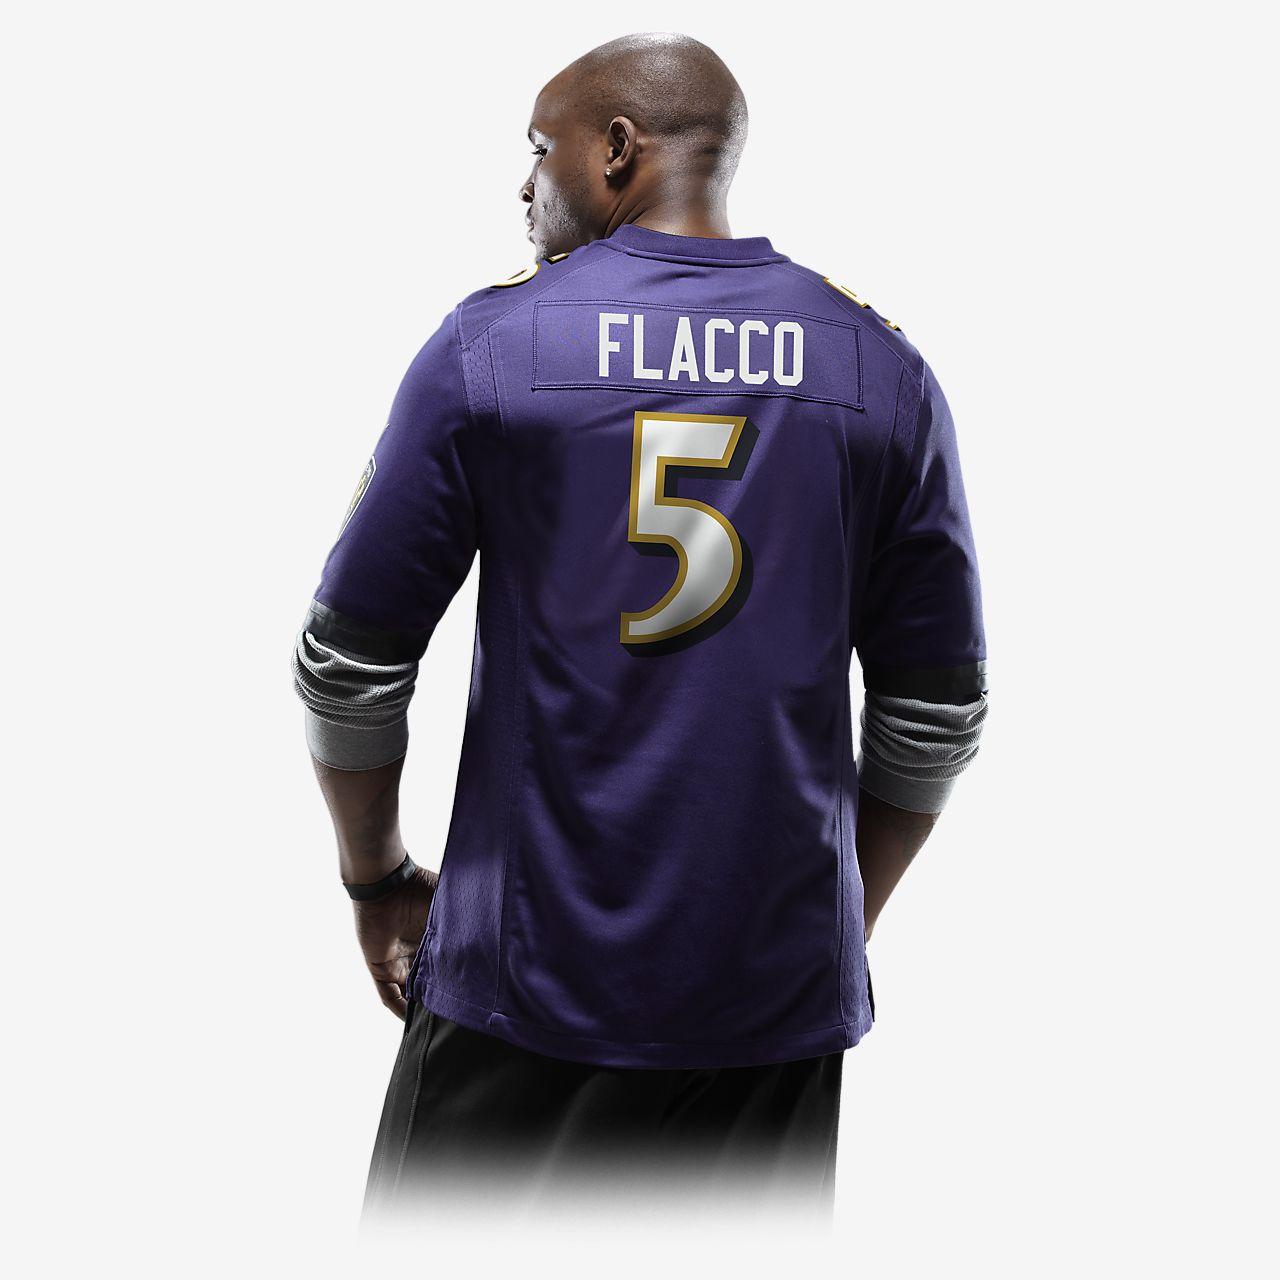 meet 8bfca 366d0 NFL Baltimore Ravens (Joe Flacco) Men's American Football Home Game Jersey